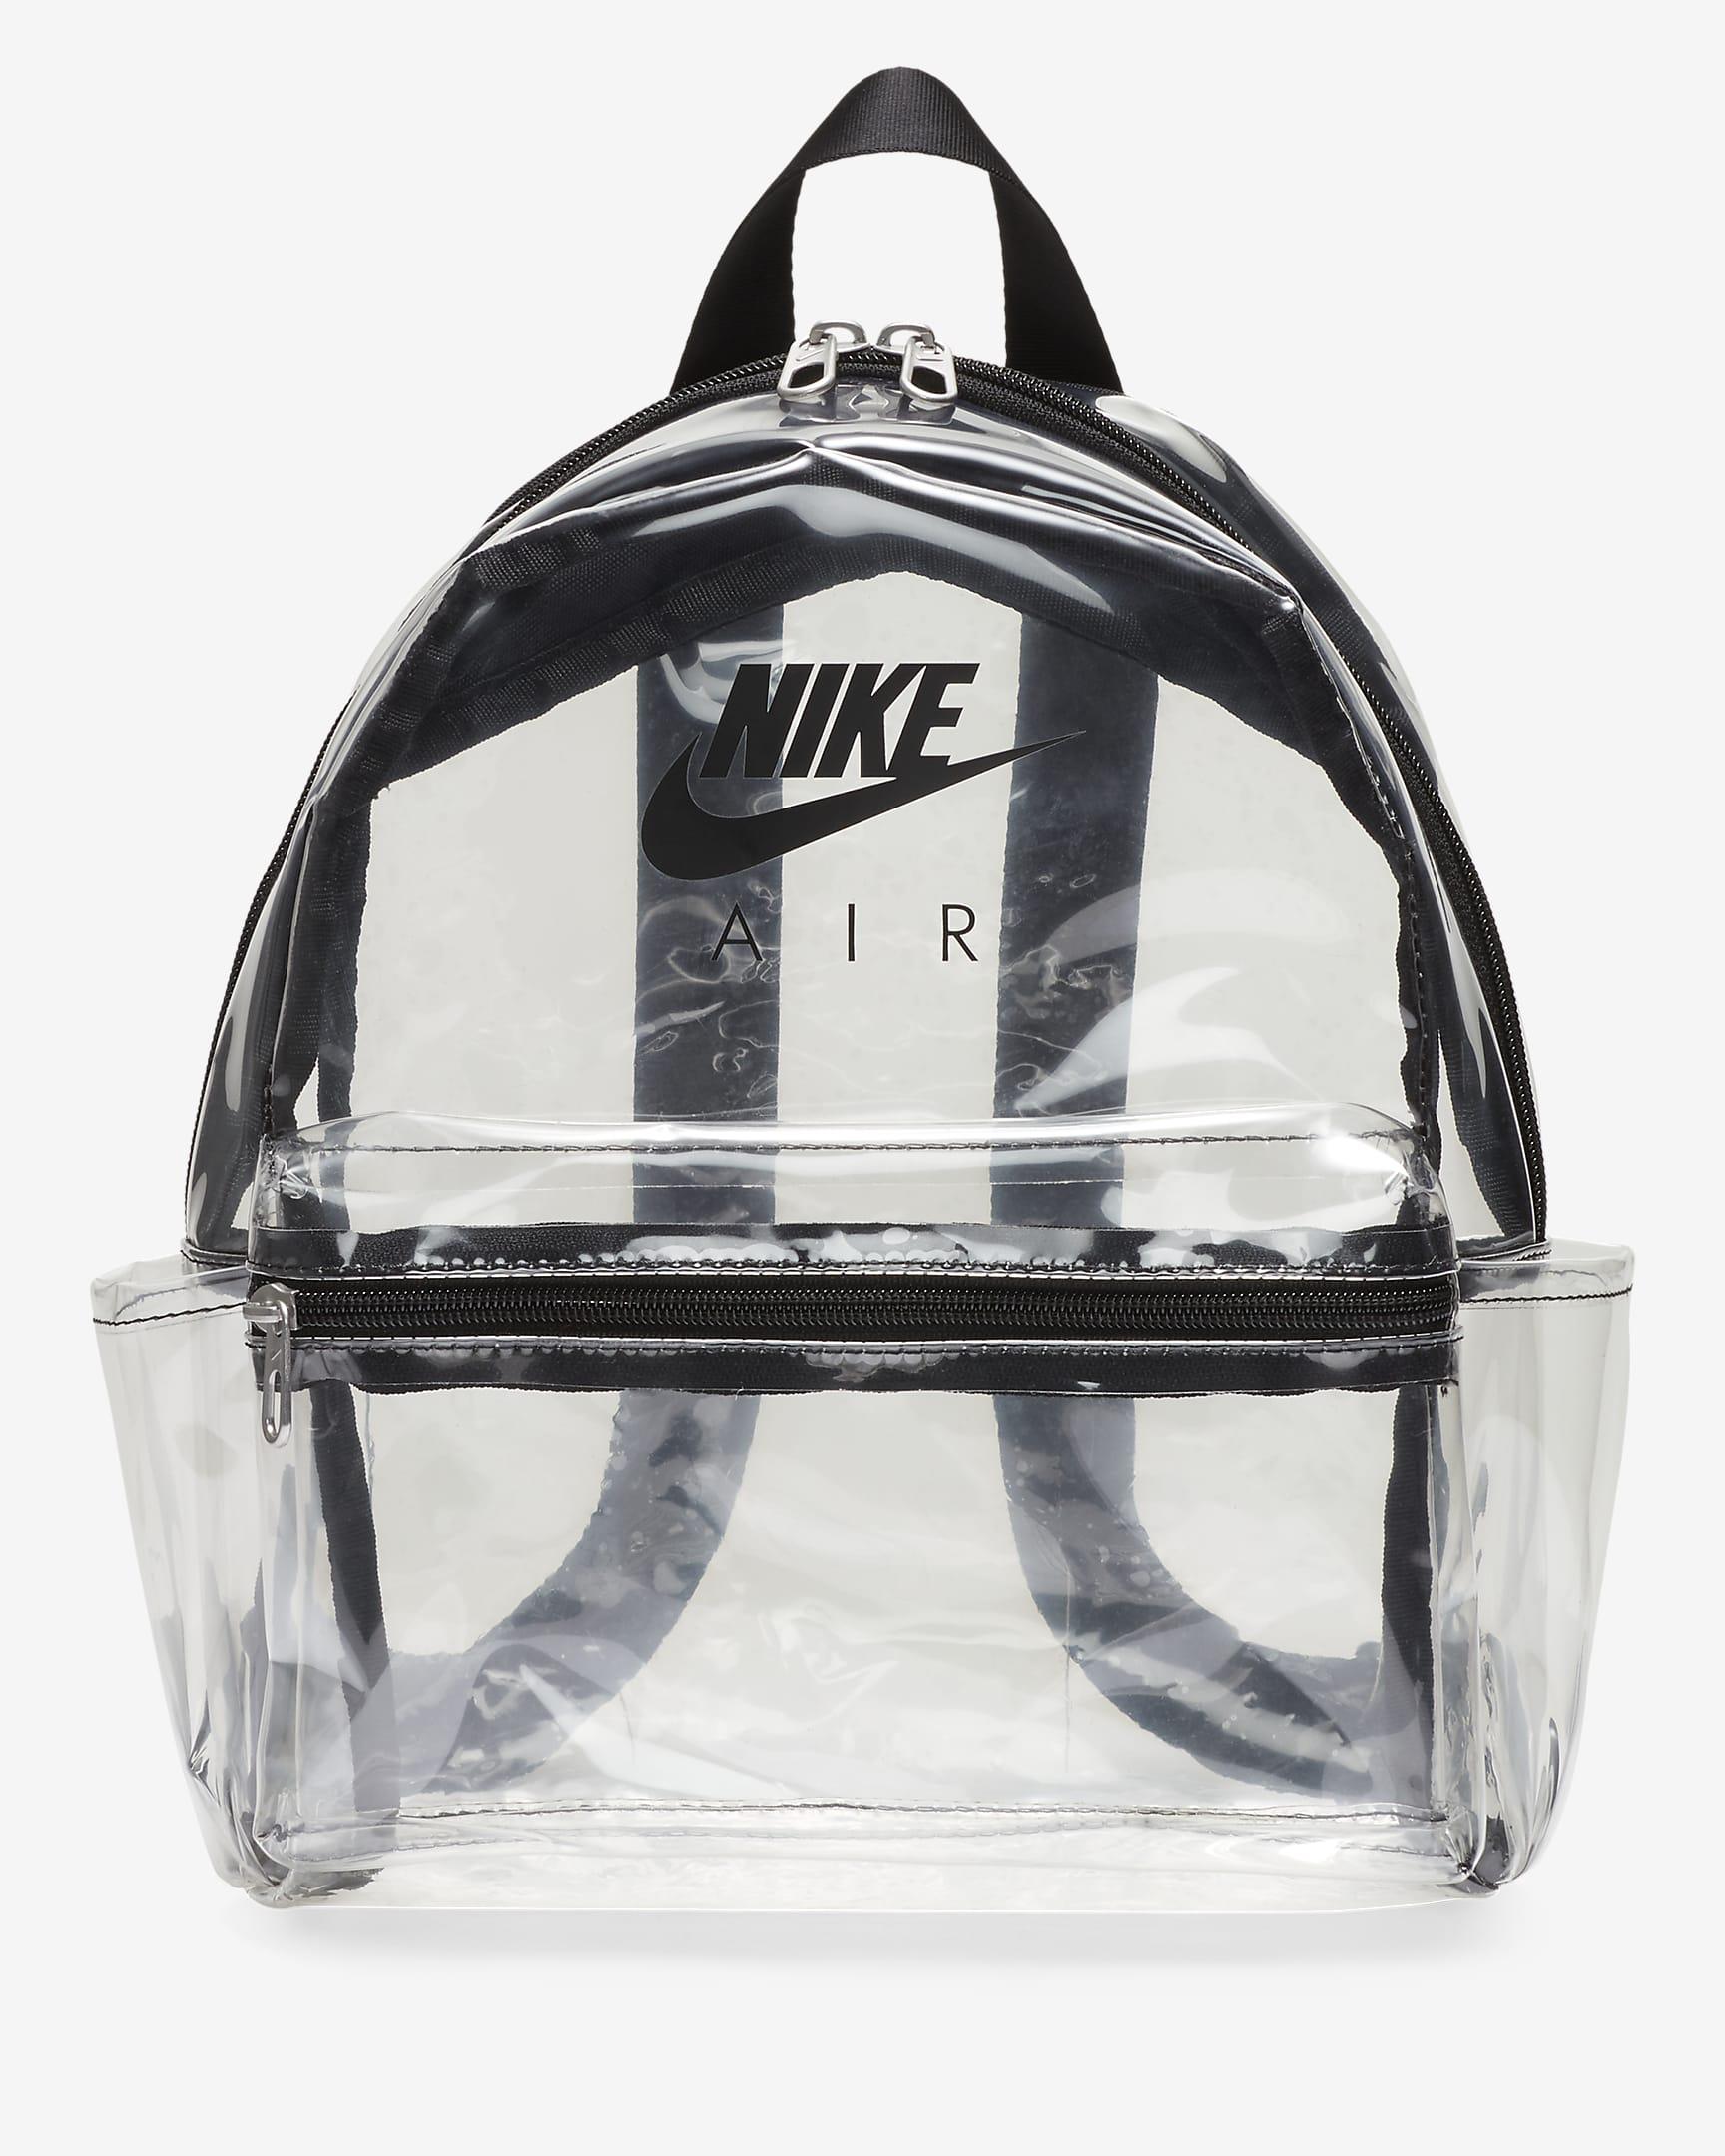 Mini mochila transparente de Nike Air